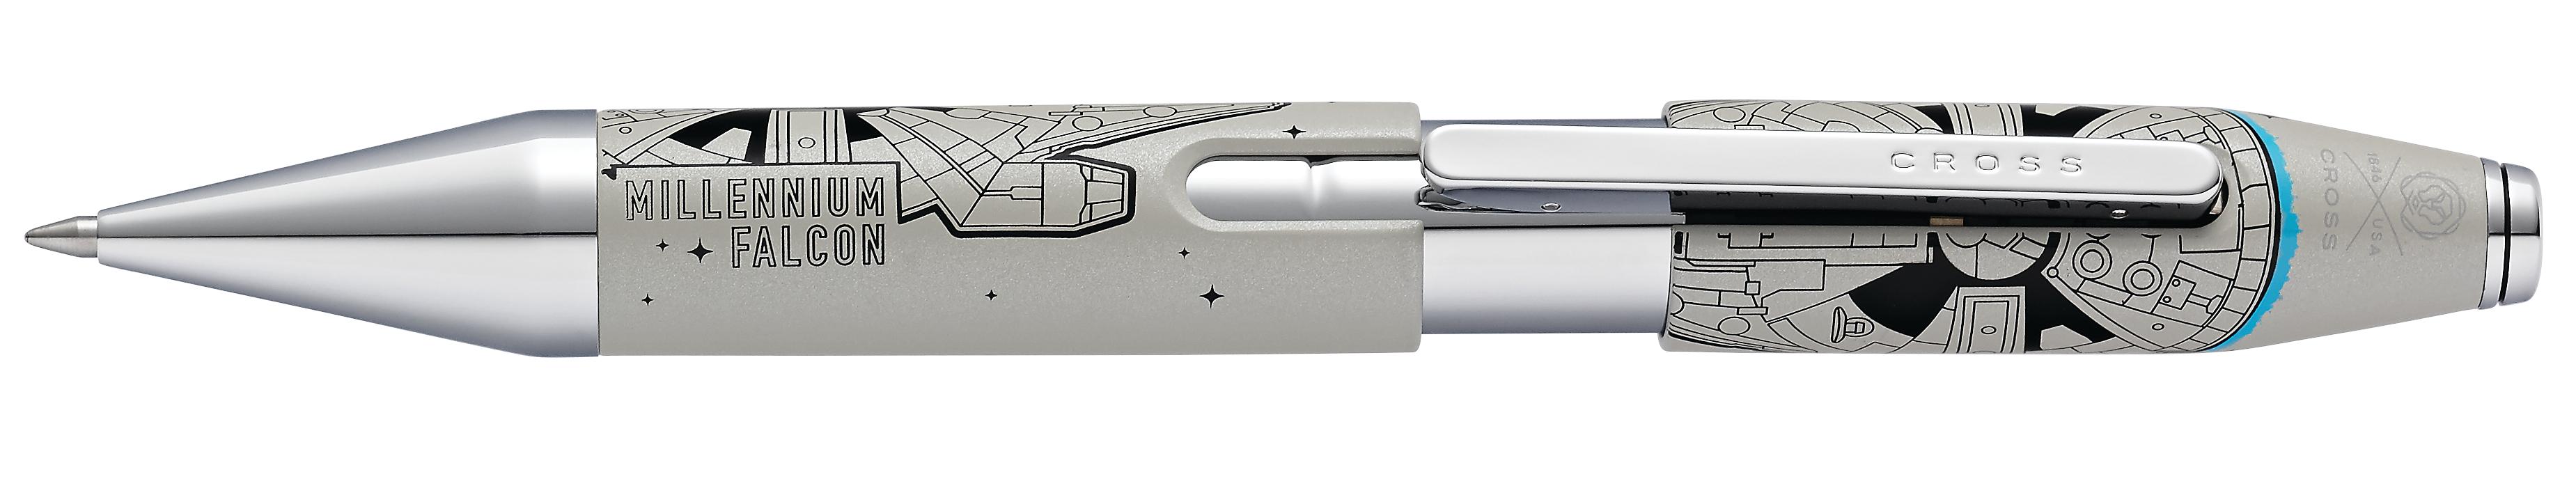 Cross X Star Wars™ Millennium™ Falcon Rollerball Pen